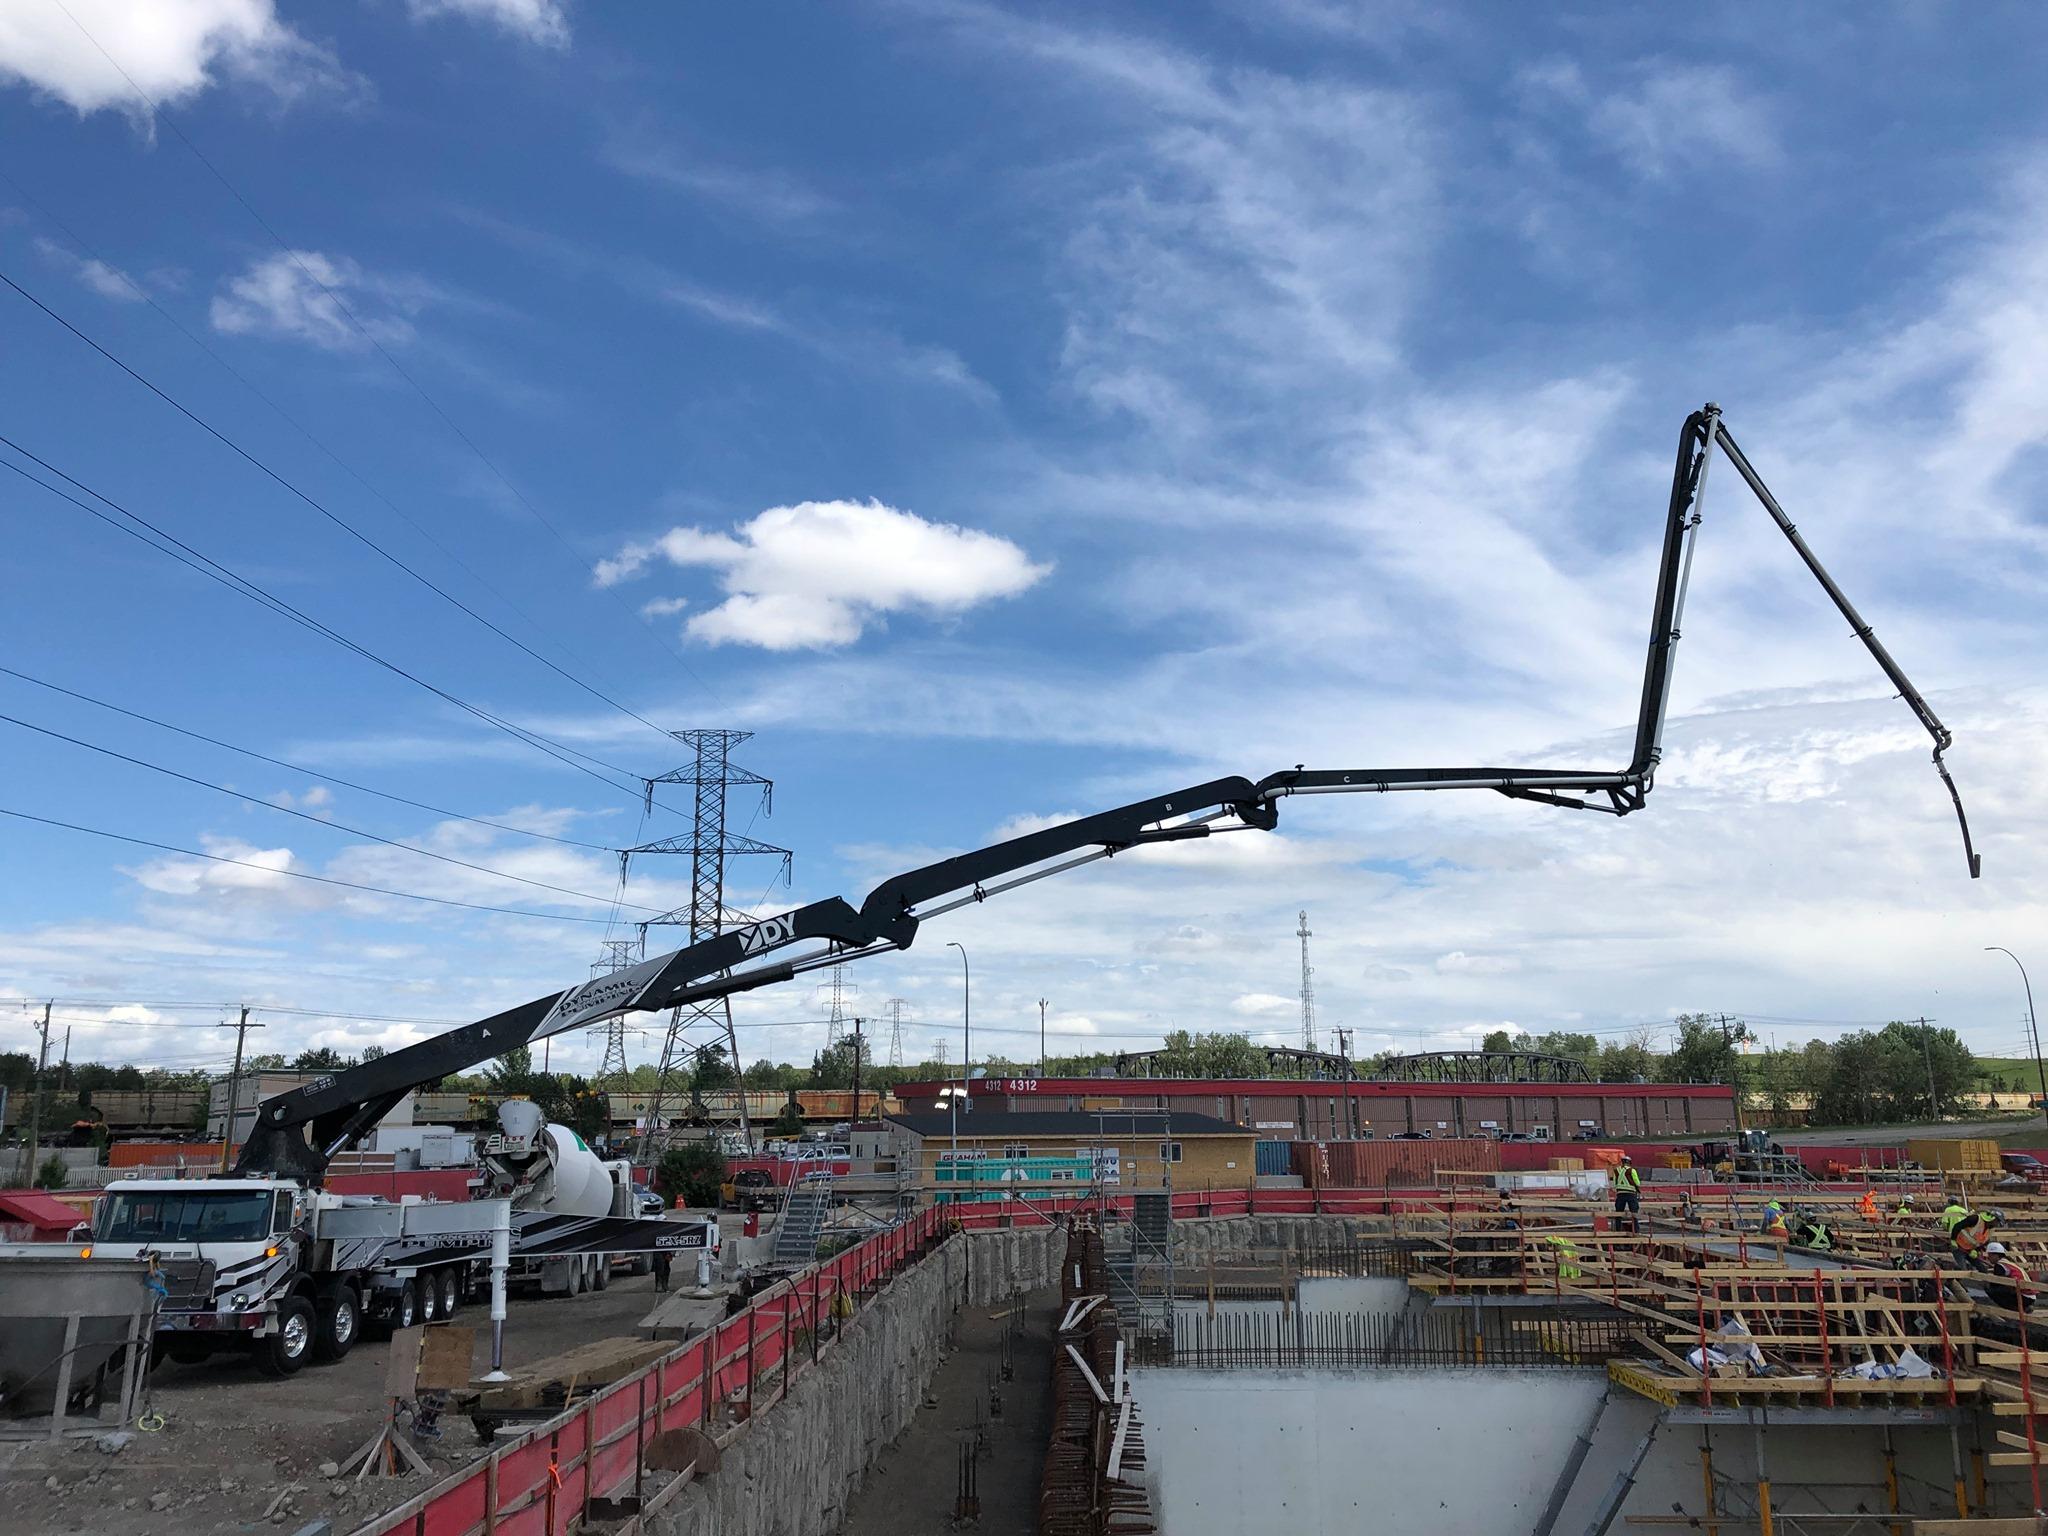 Dynamic Concrete Pumping utilizing their 52-meter concrete boom pump on a job